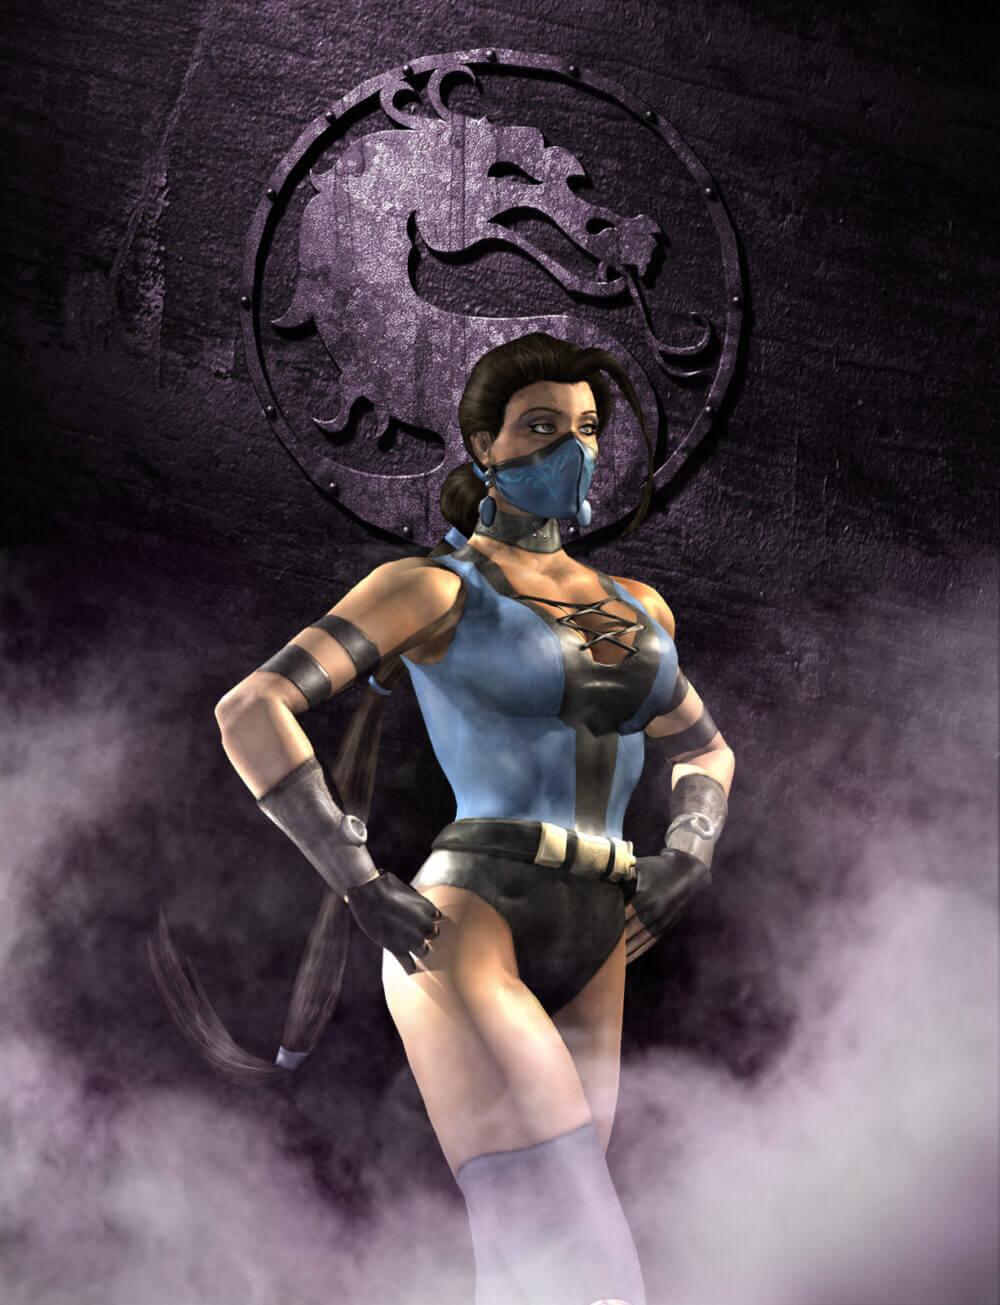 Top 5 Mortal Kombat Characters | Pixelated Geek